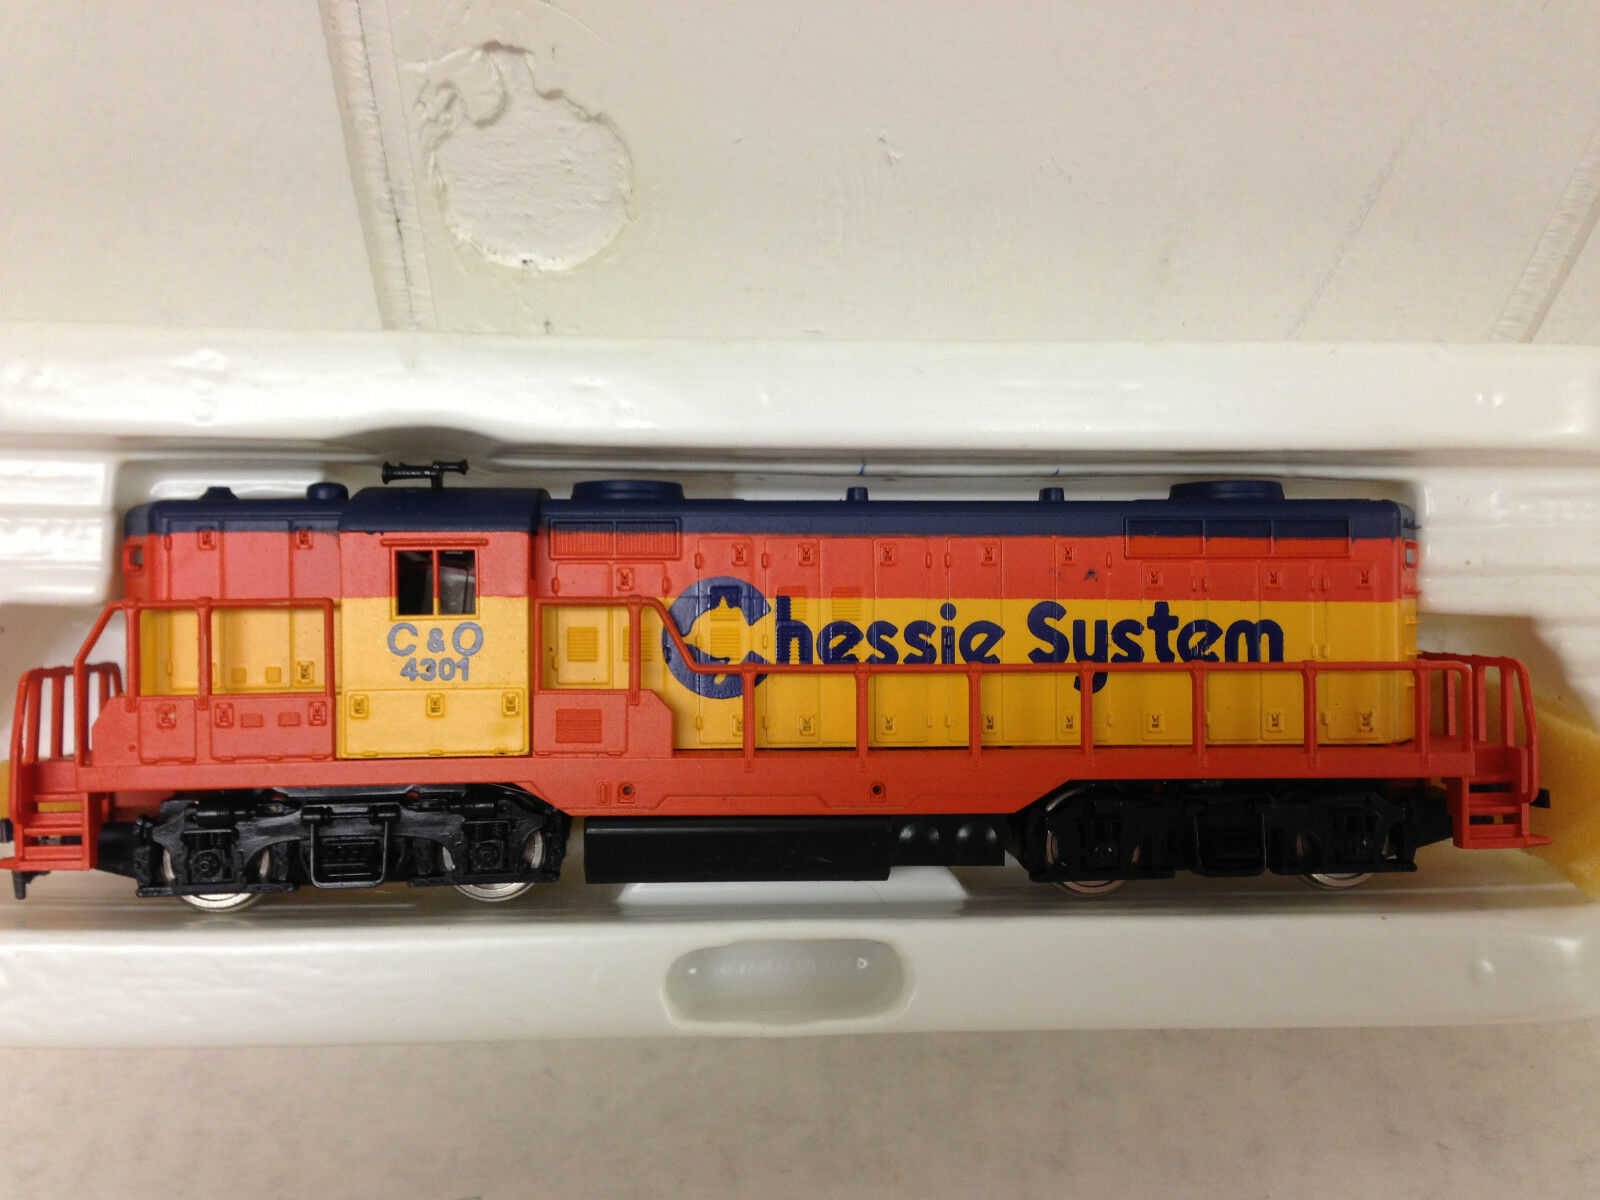 AHM HO Train EMD GP-18 Chessie System Engine Diesel Loco  4301 Never Run 5012